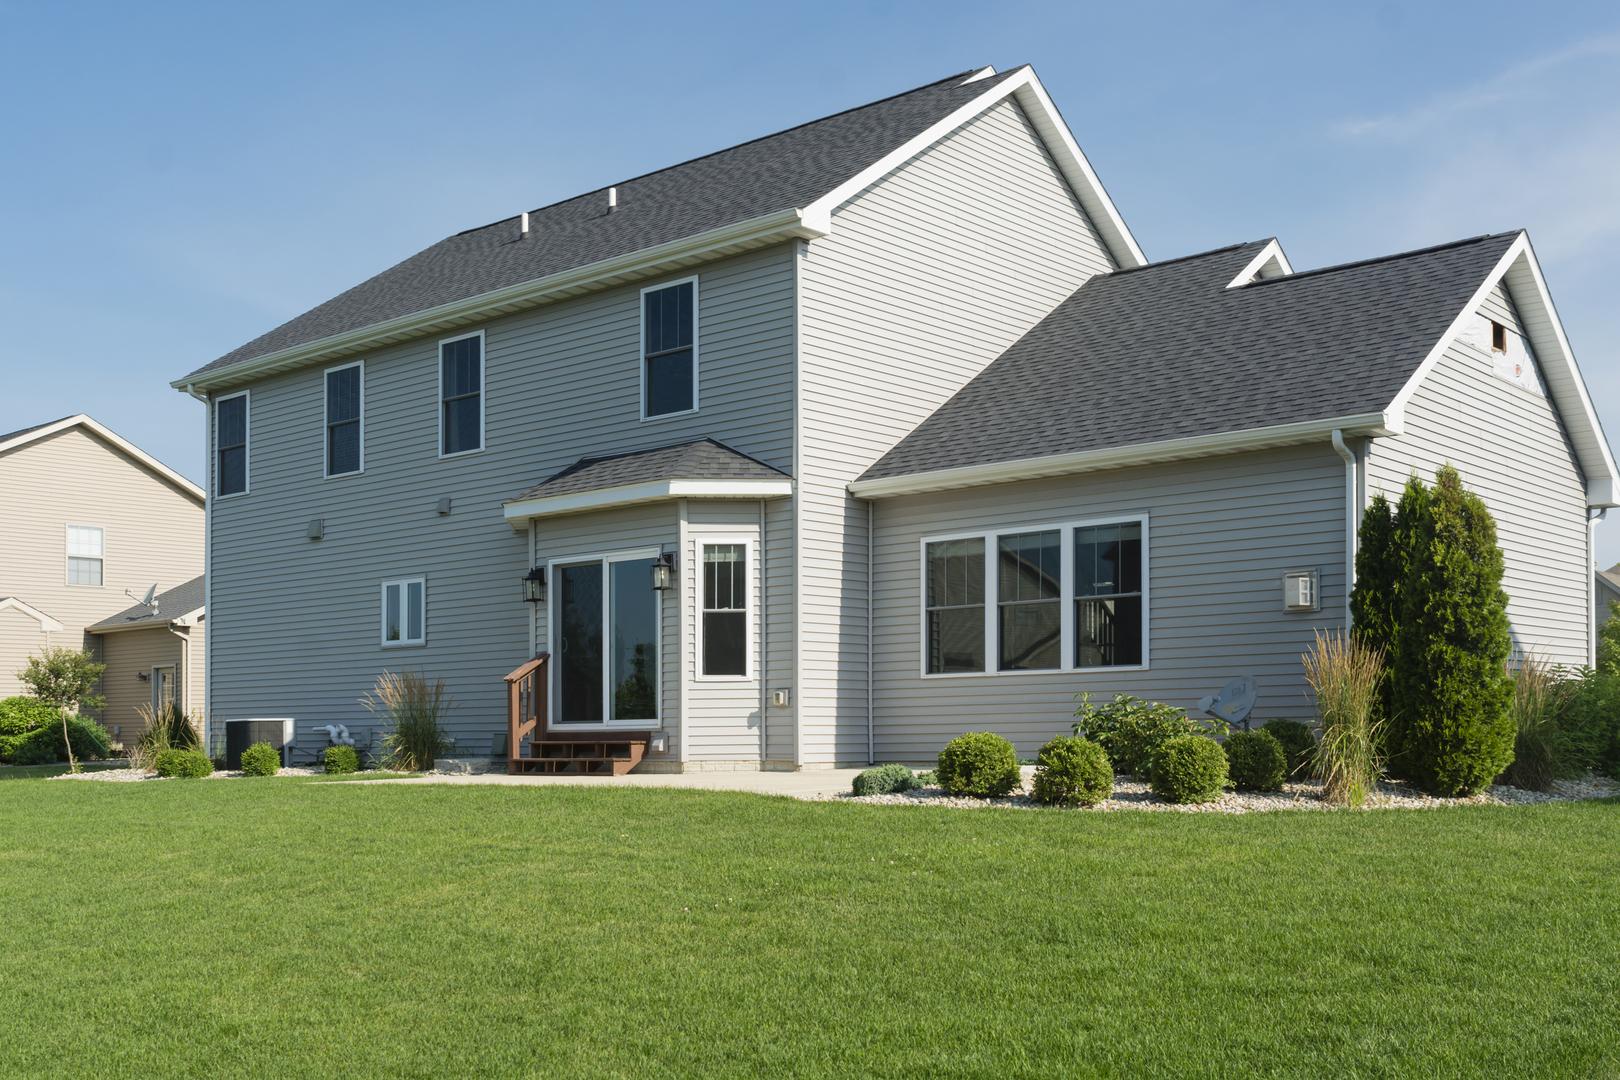 4813 Sandcherry, Champaign, Illinois, 61822